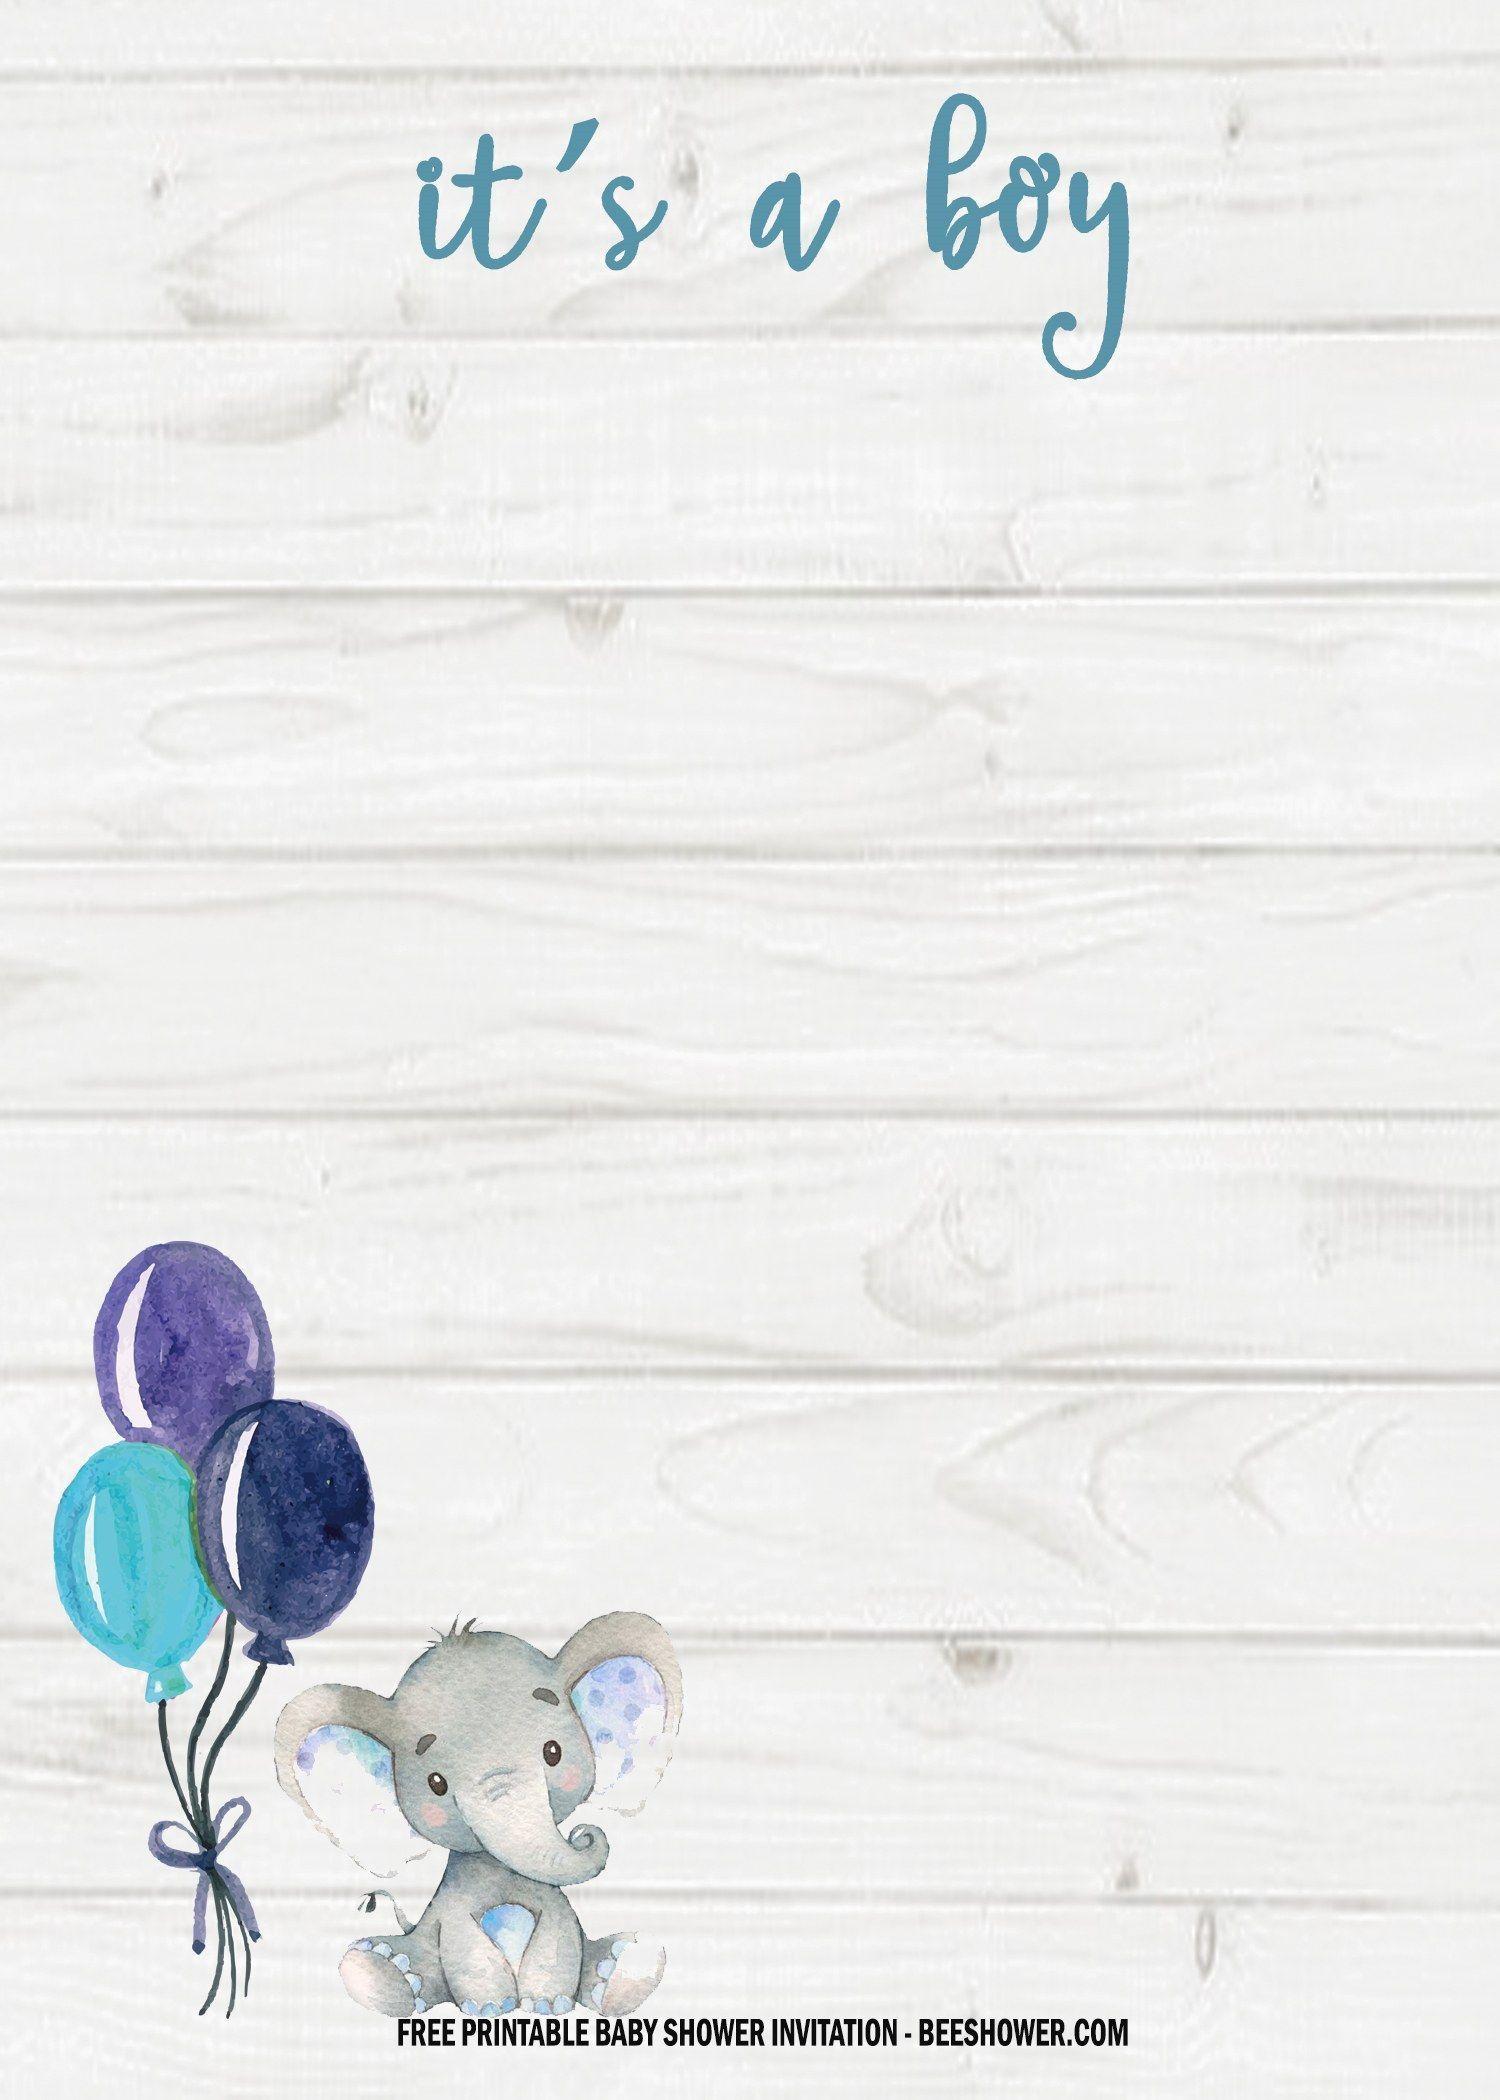 005 Wonderful Free Printable Elephant Baby Shower Invitation Template Inspiration  Templates EditableFull